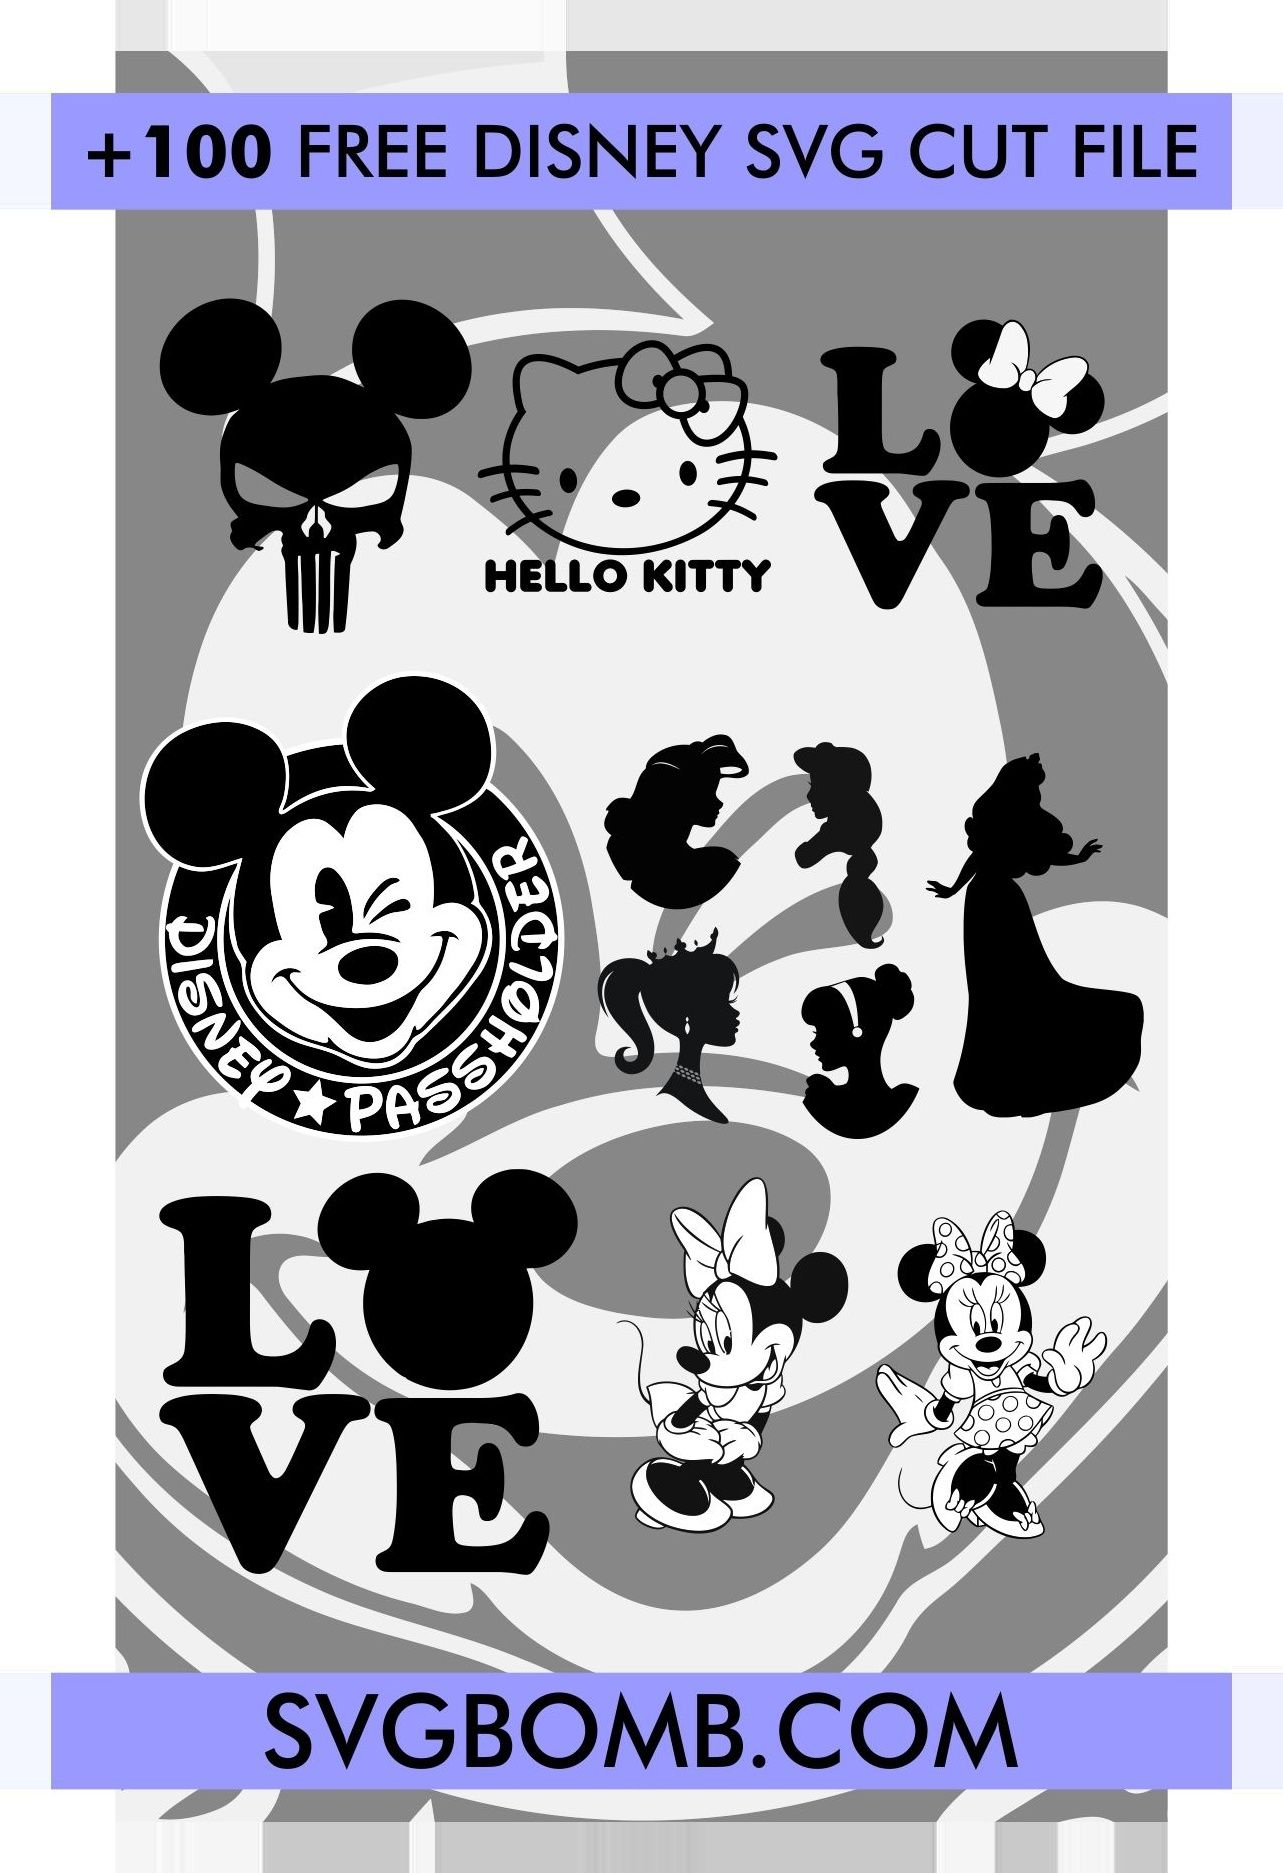 Disney SVG Bundles crafter handmade art etsy crafts